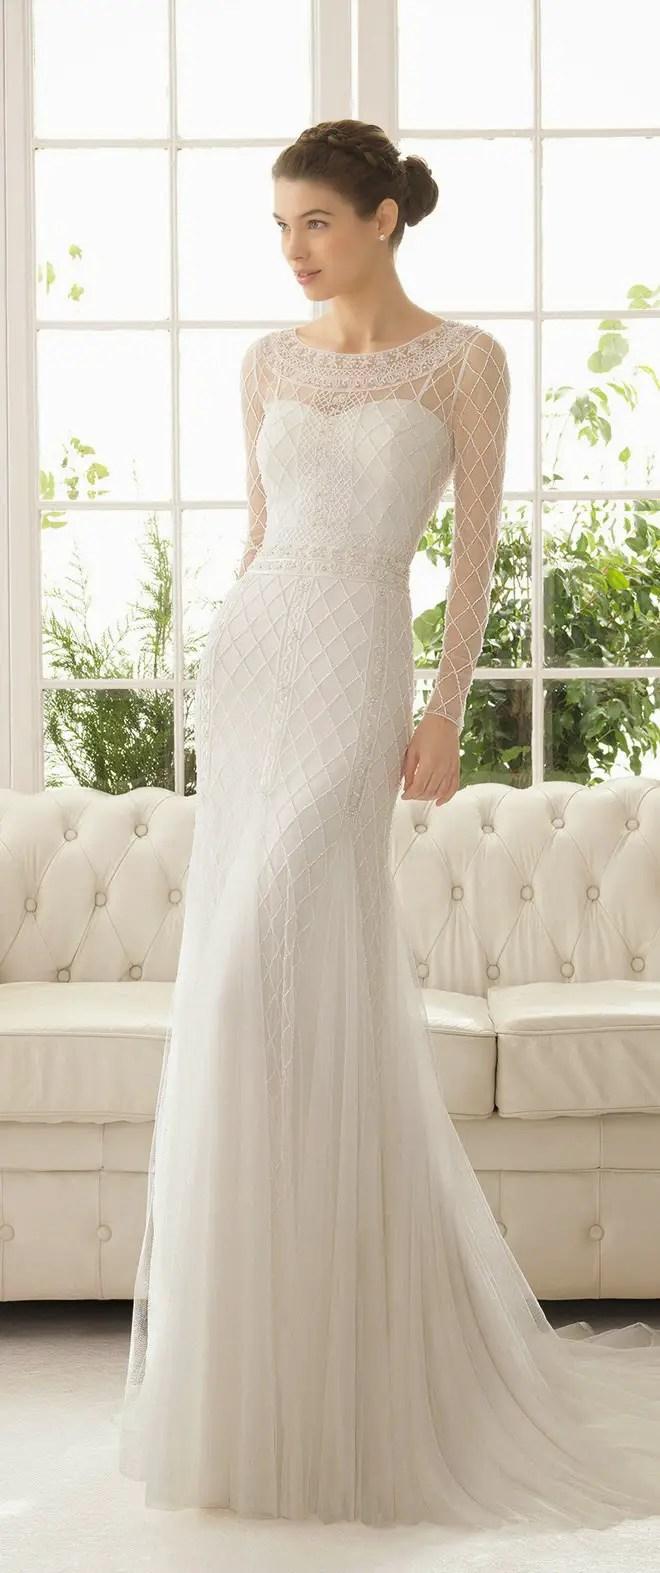 Winter Wedding Bridesmaids Dresses